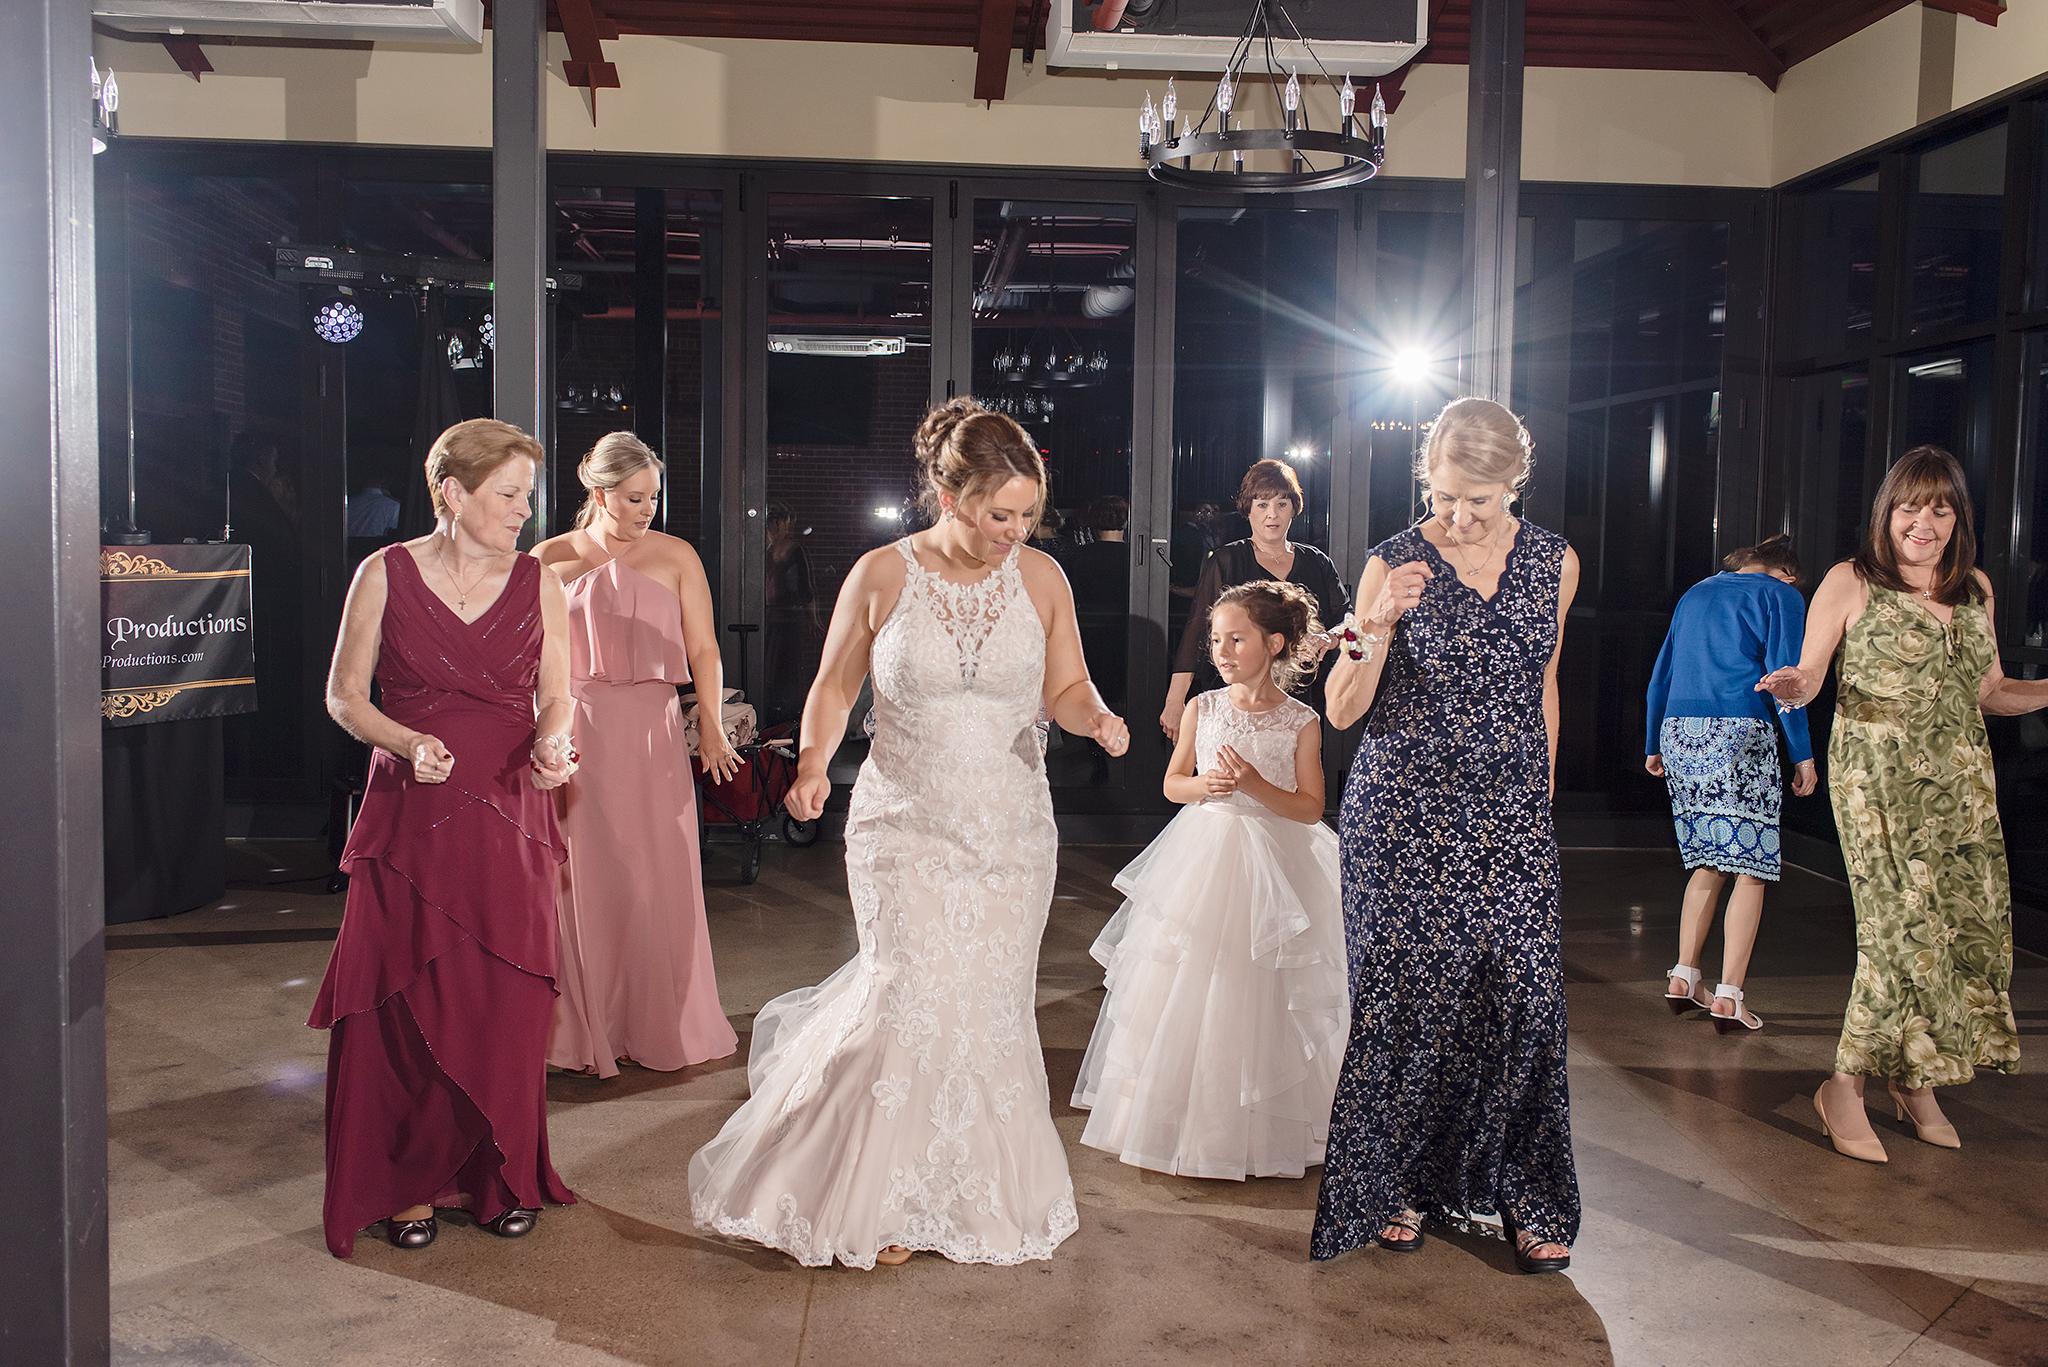 LINDSAY-ADKINS-PHOTOGRAPHY-MICHIGAN-WEDDING-PHOTOGRAPHER-FRANKENMUTH-BREWERY-WEDDING-MICHIGAN-BLOG-35